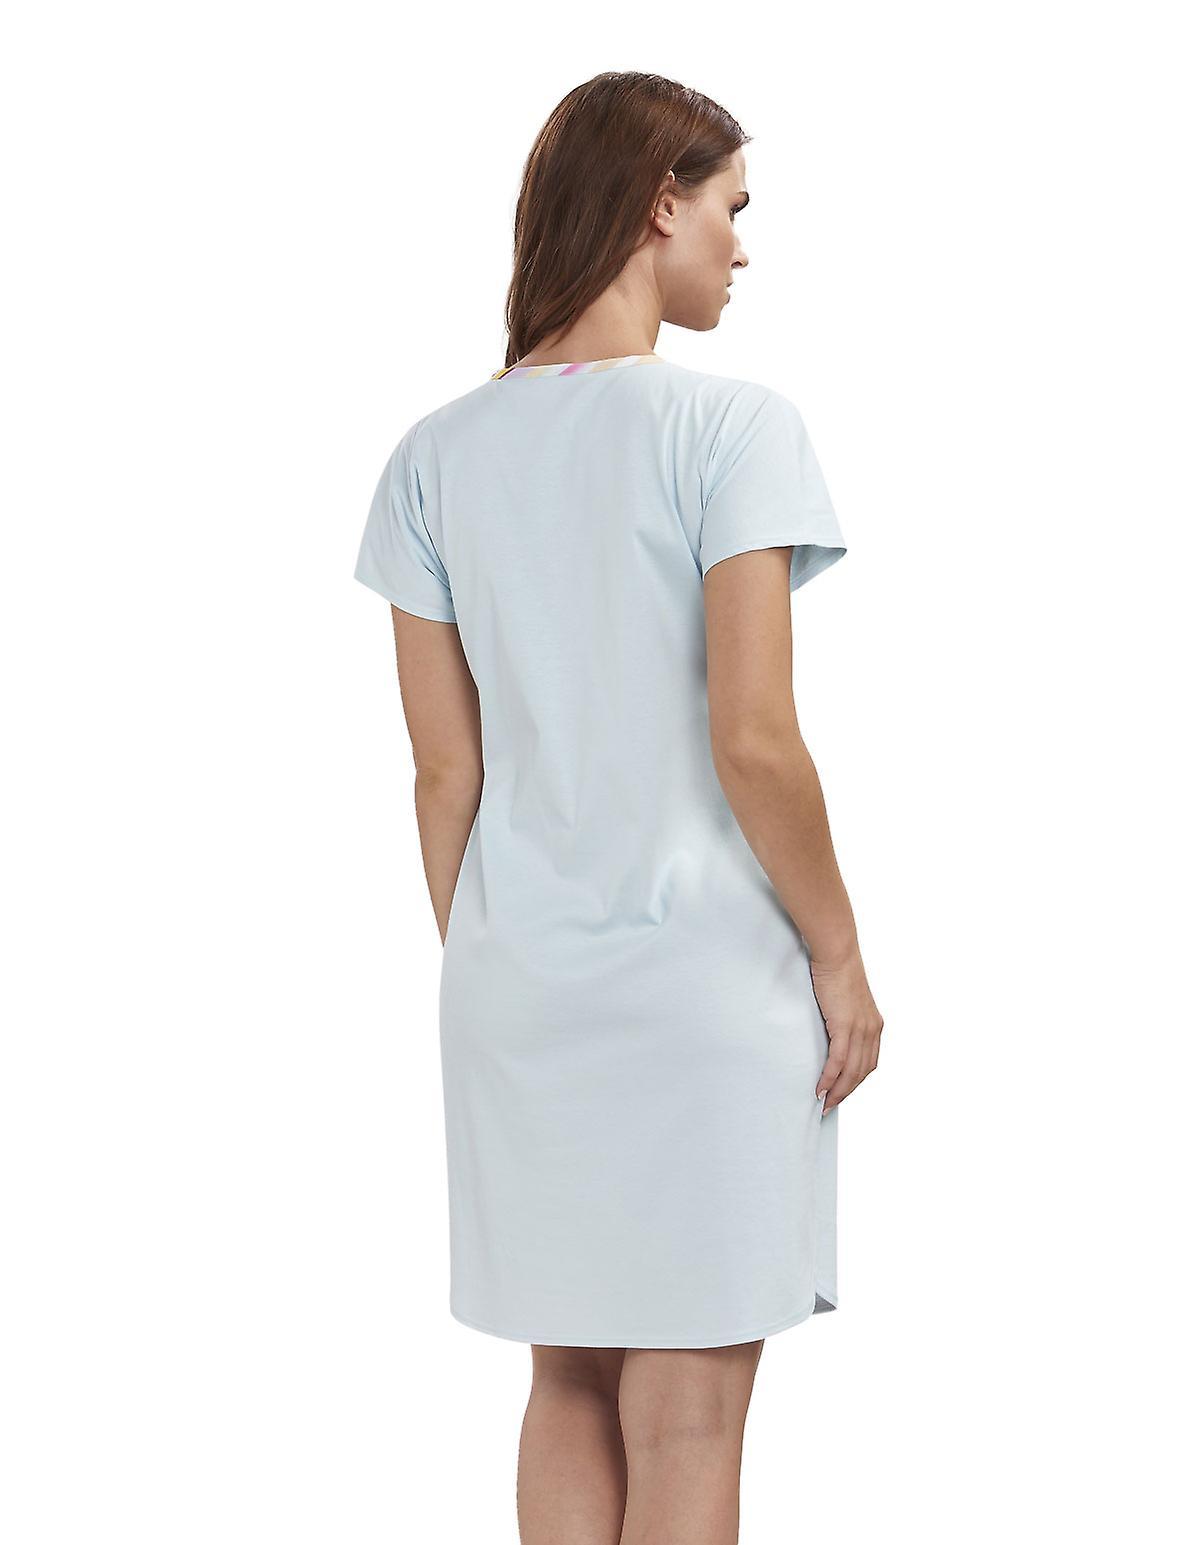 Feraud 3191344-16502 Women's High Class Soft Turquoise Cotton Night Gown Loungewear Nightdress